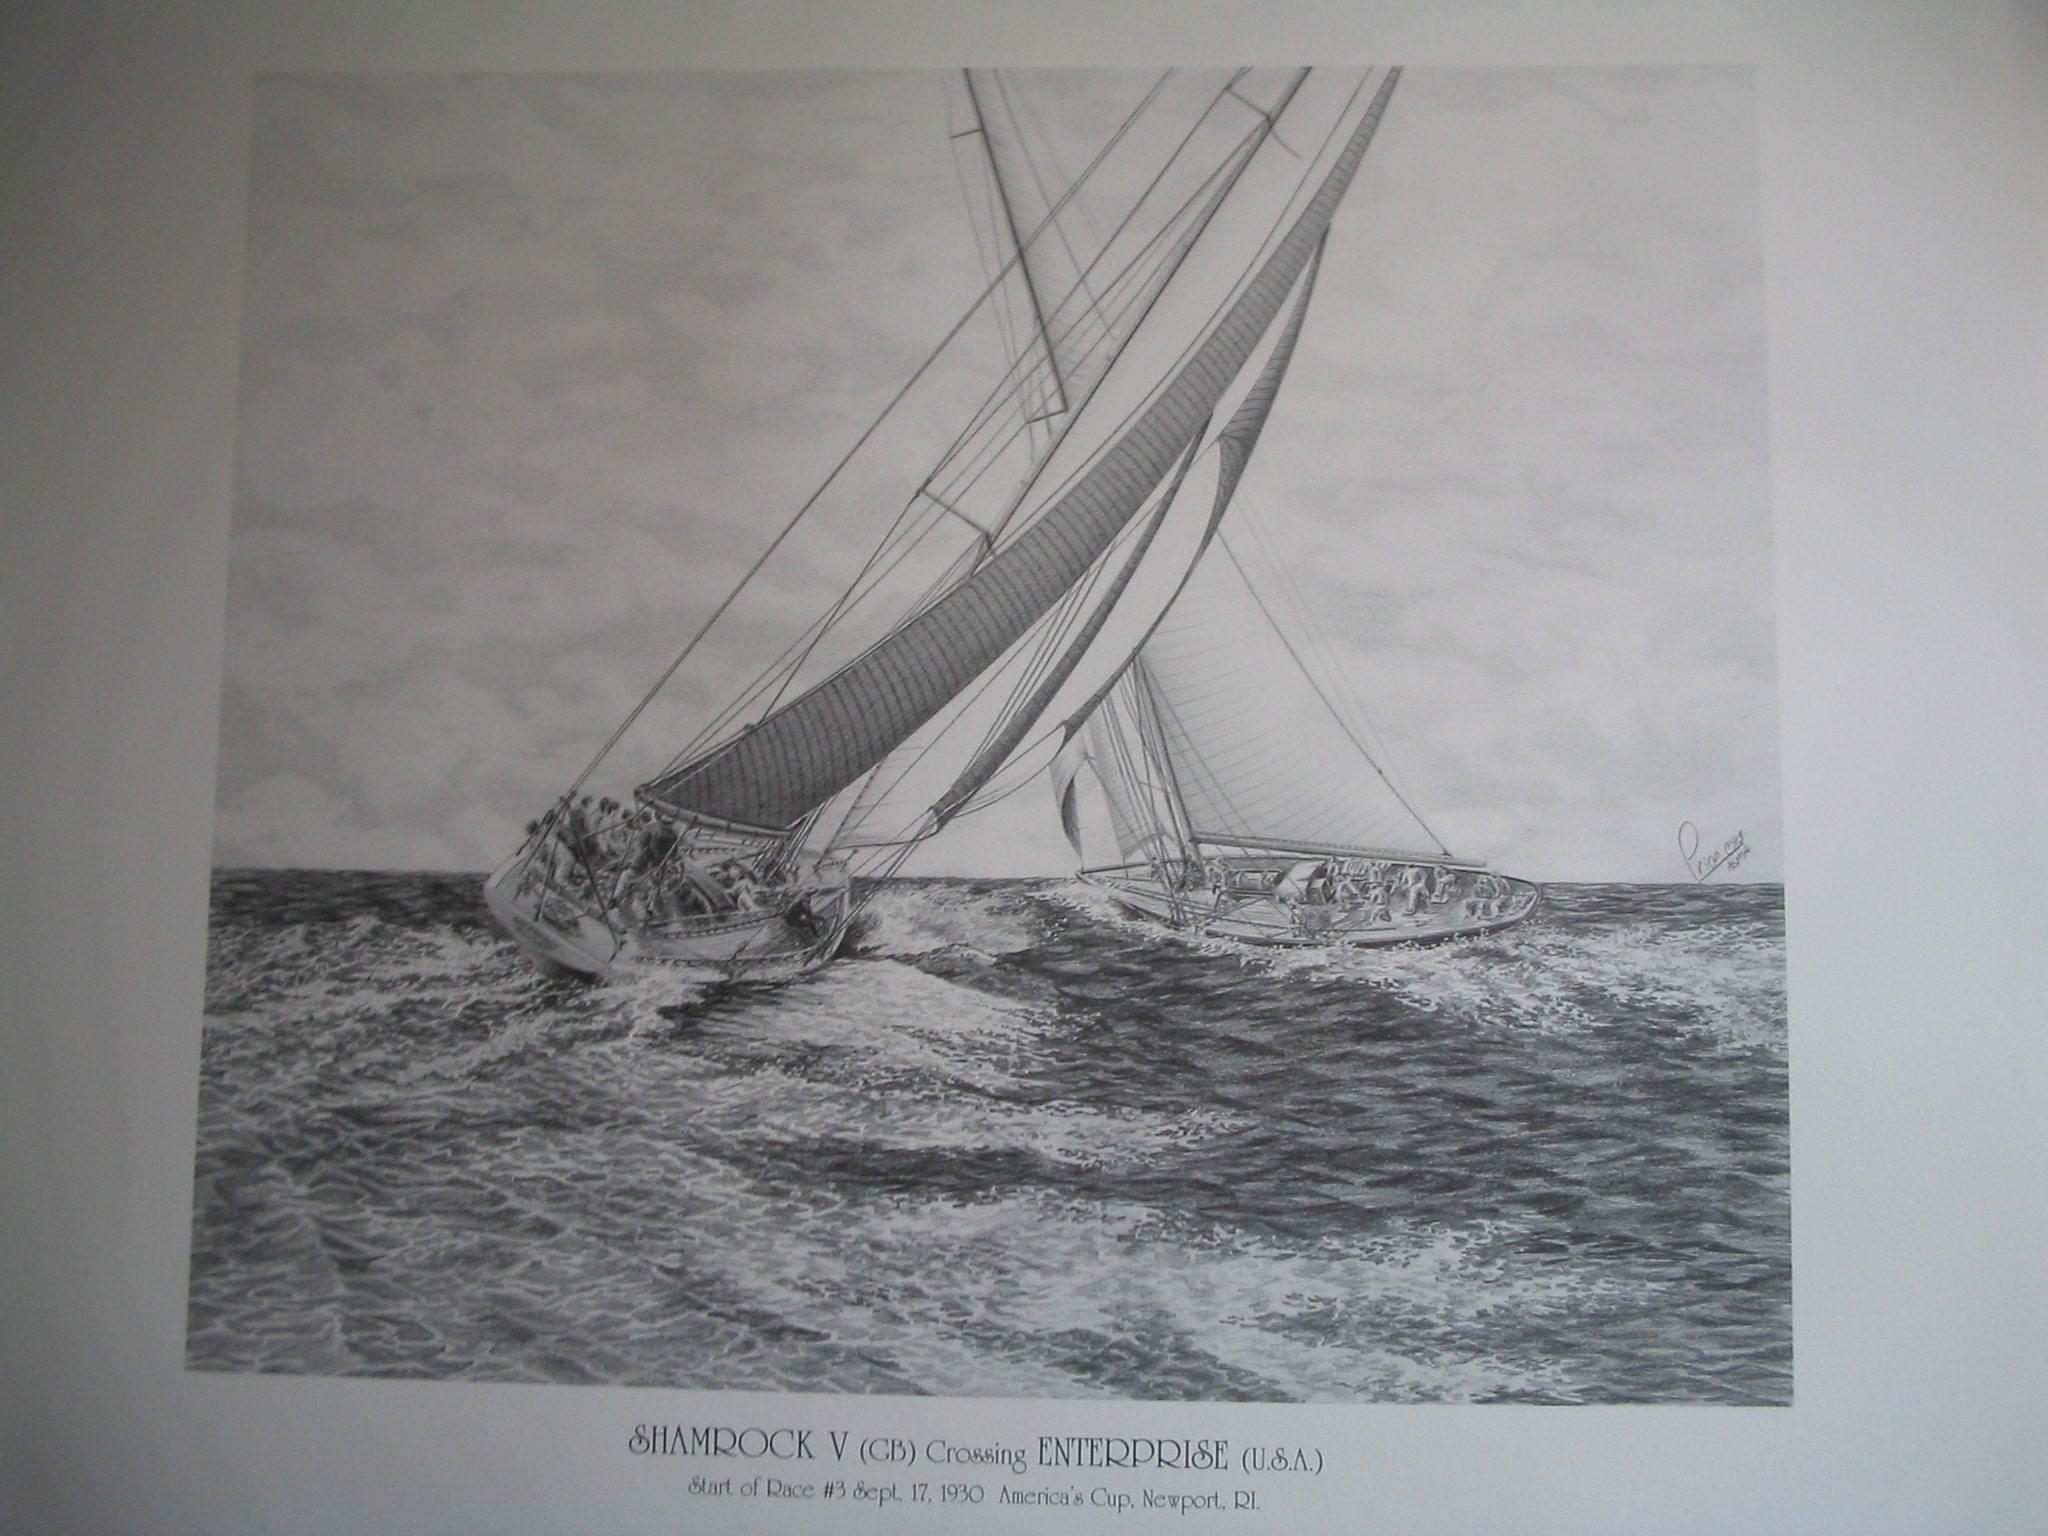 Shamrock vs Enterprise Artwork by Daniel Price